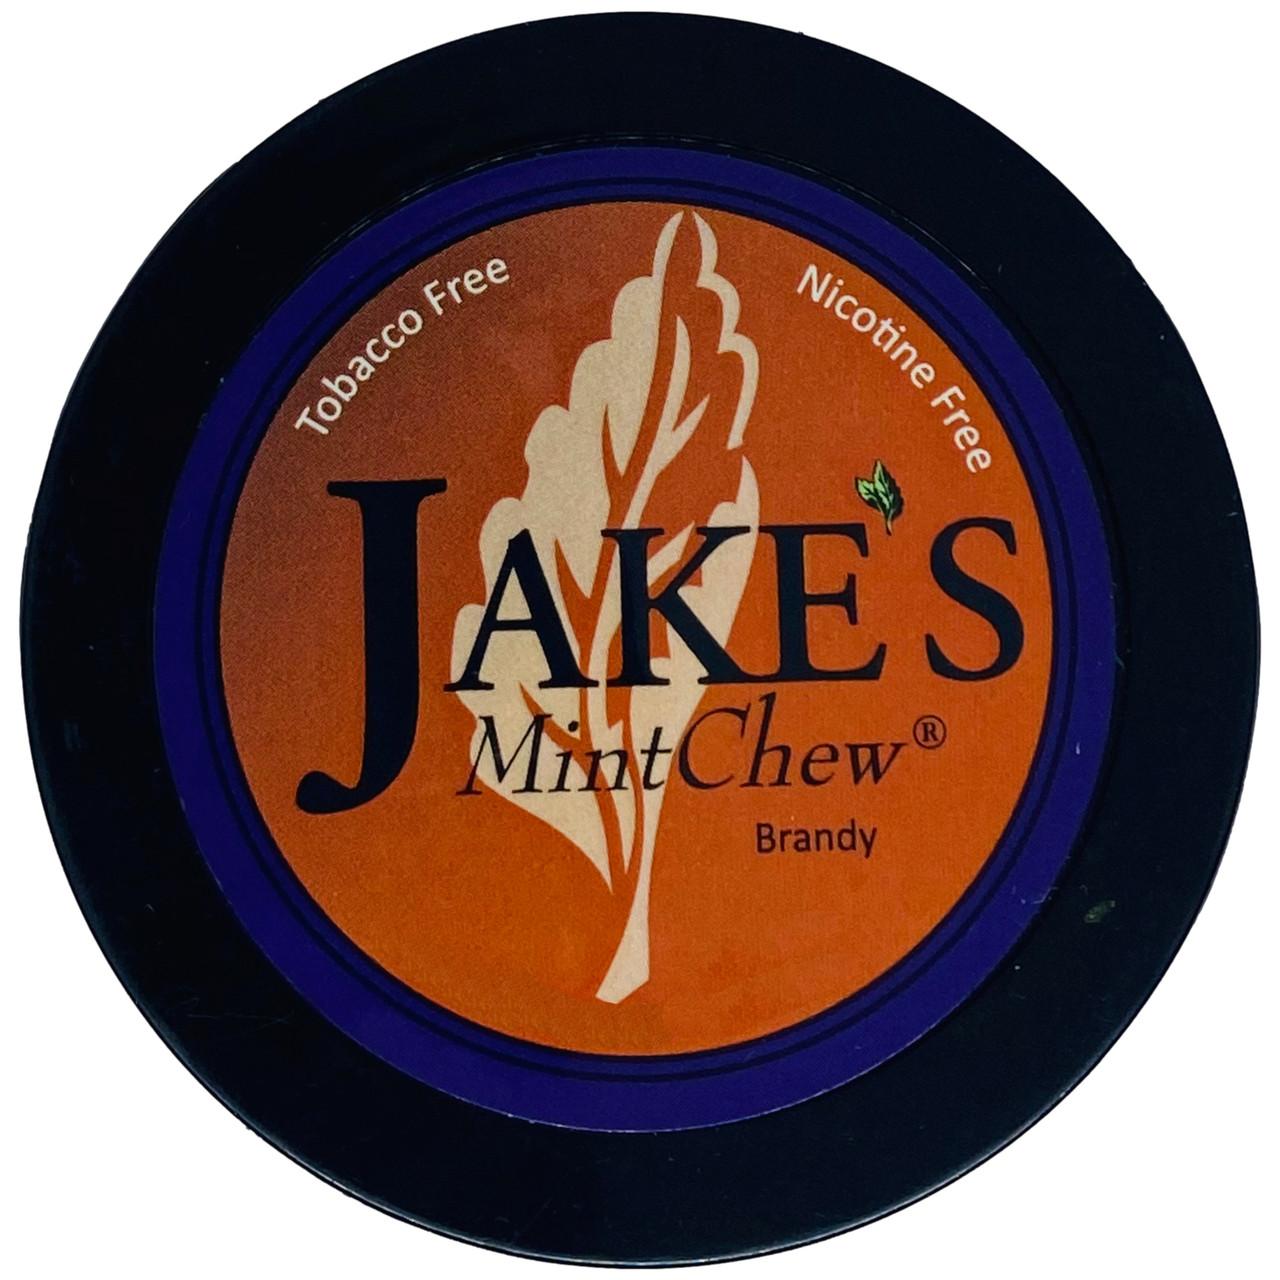 Jake's Mint Herbal Chew Brandy 1 Can